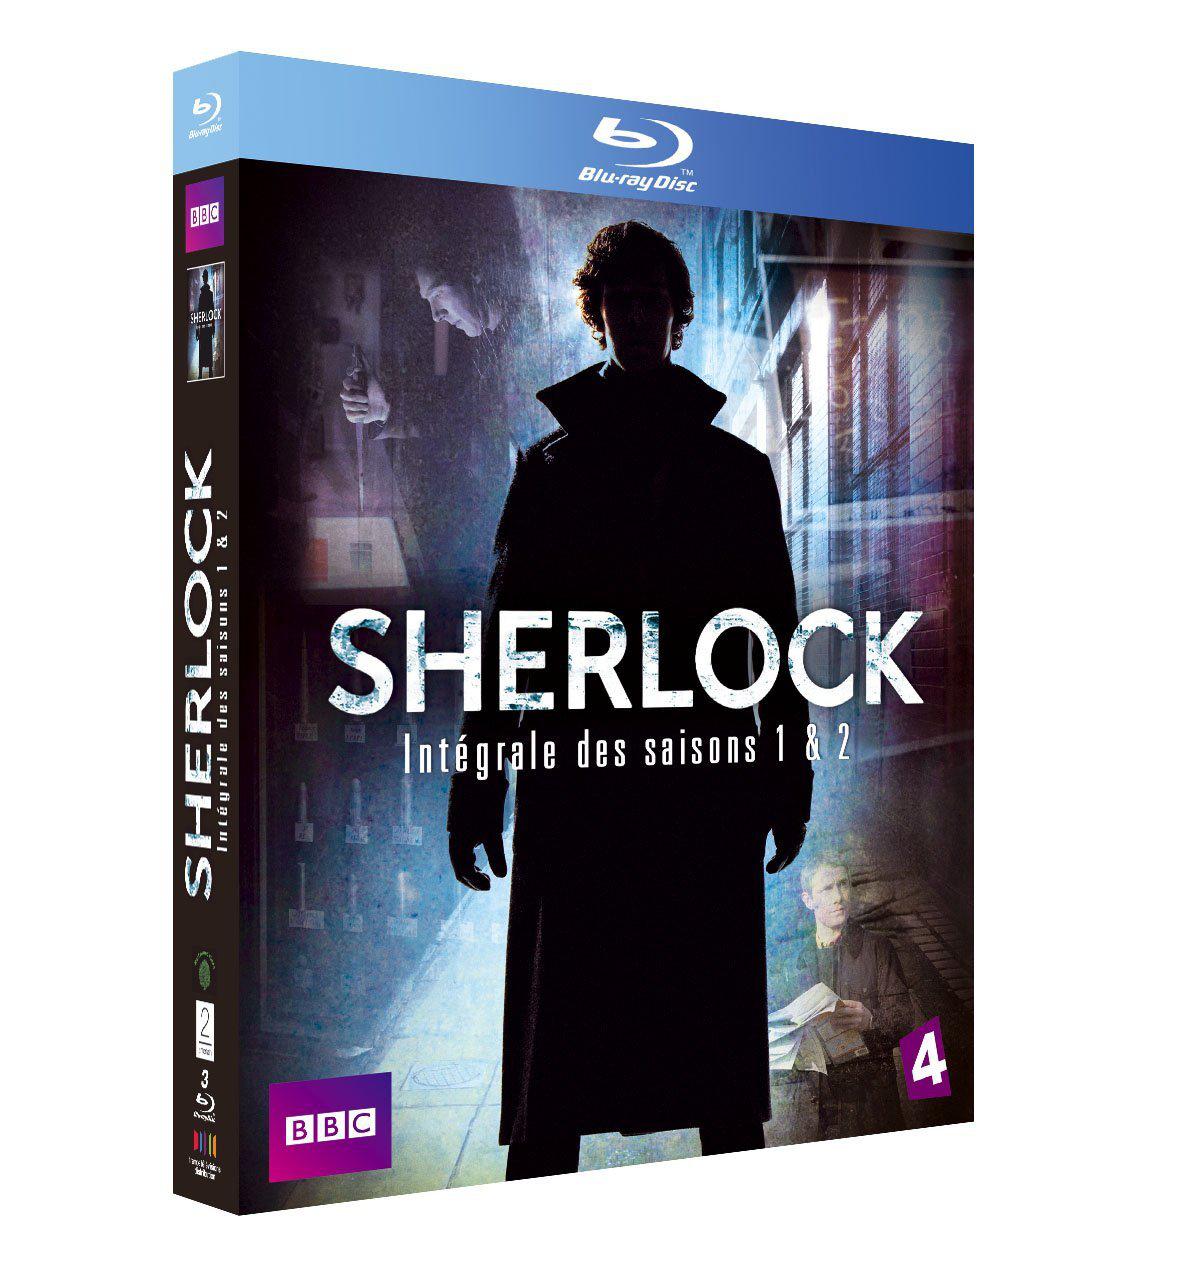 Coffret Blu-ray Sherlock Saisons 1 et 2